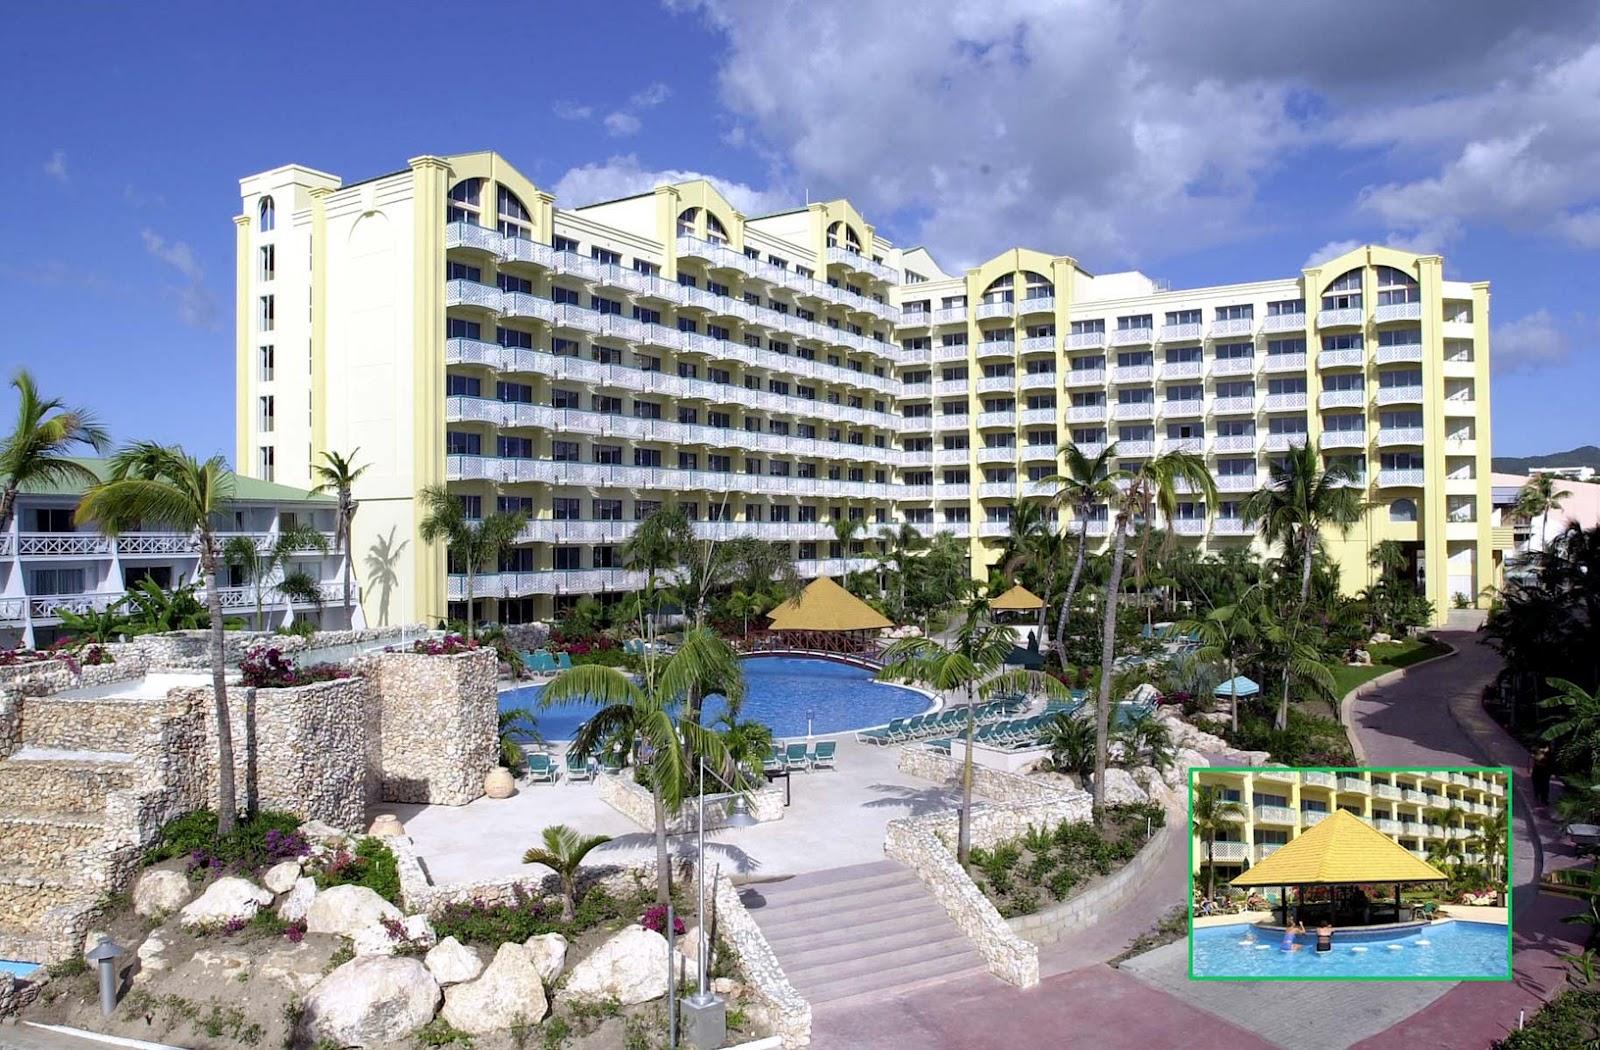 Caribbean News by Melanie Reffes Sassy in St Maarten  A